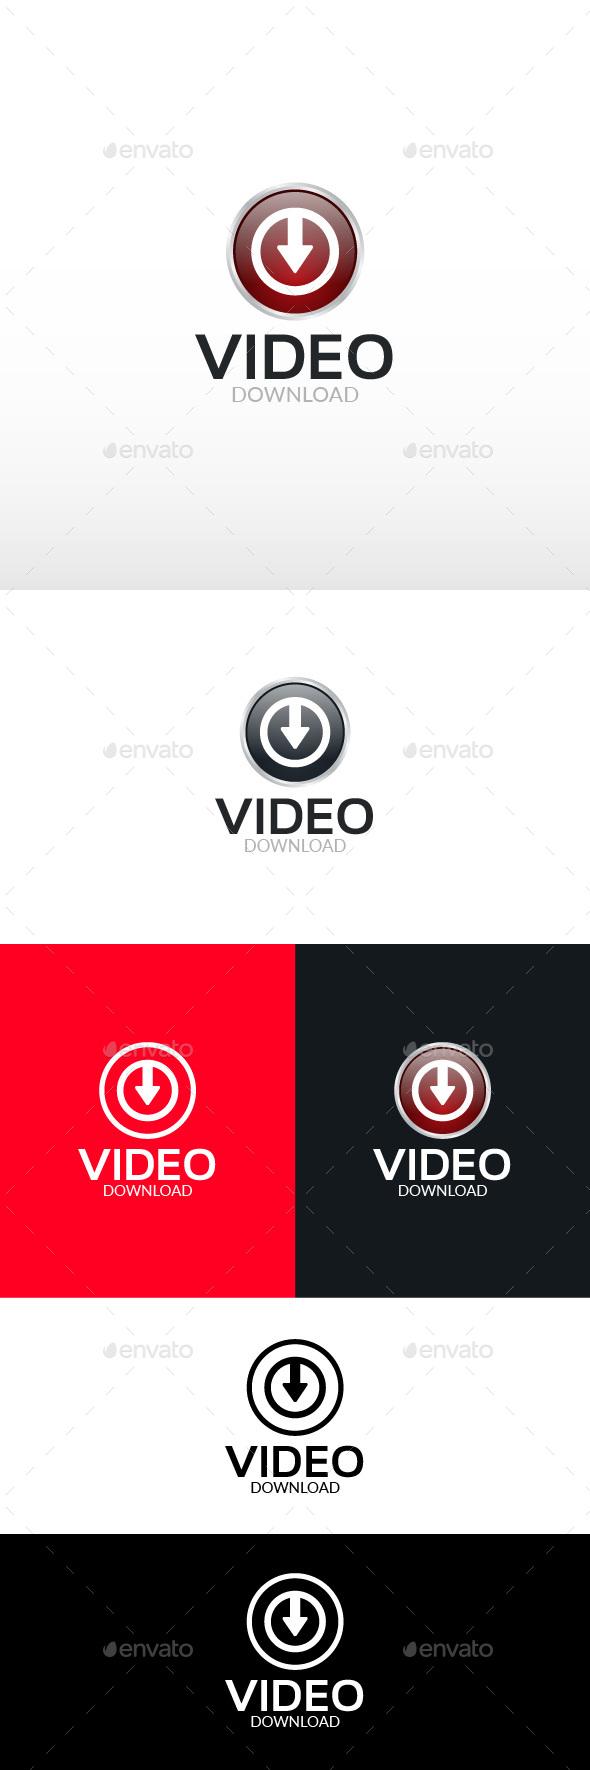 Video Downloader Logo Template